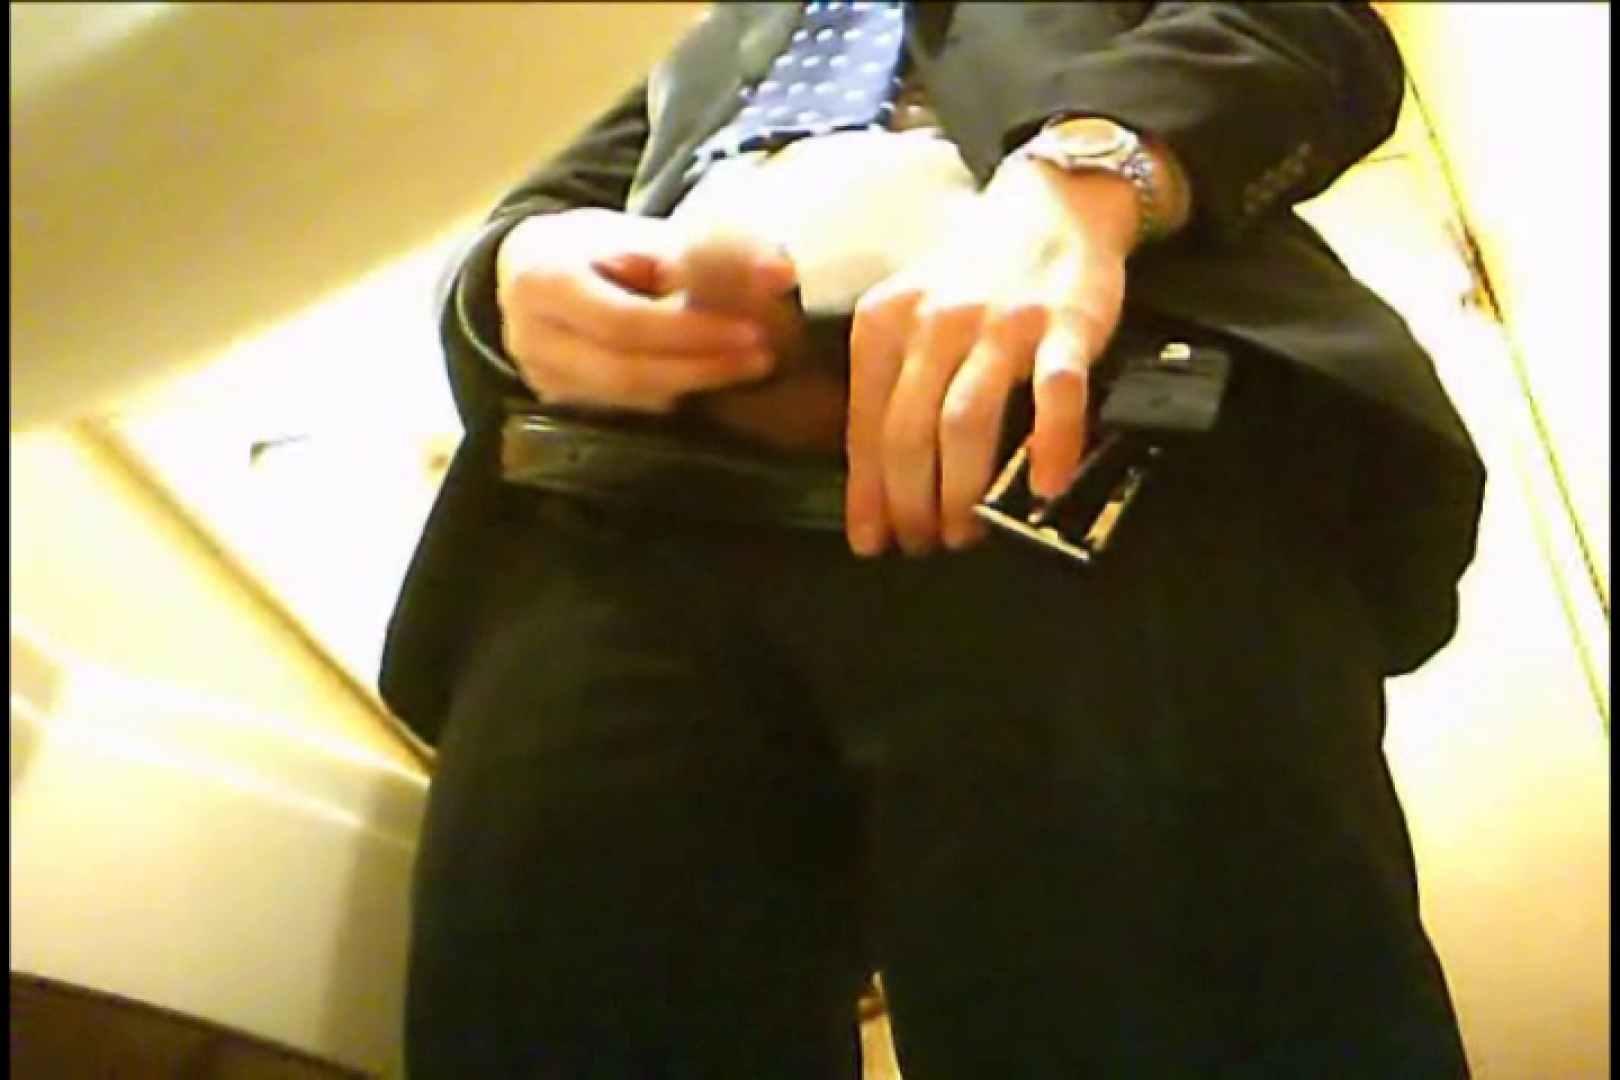 Gボーイ初投稿!掴み取りさんの洗面所覗き!in新幹線!VOL.01 スーツボーイズ | 男天国  103pic 67